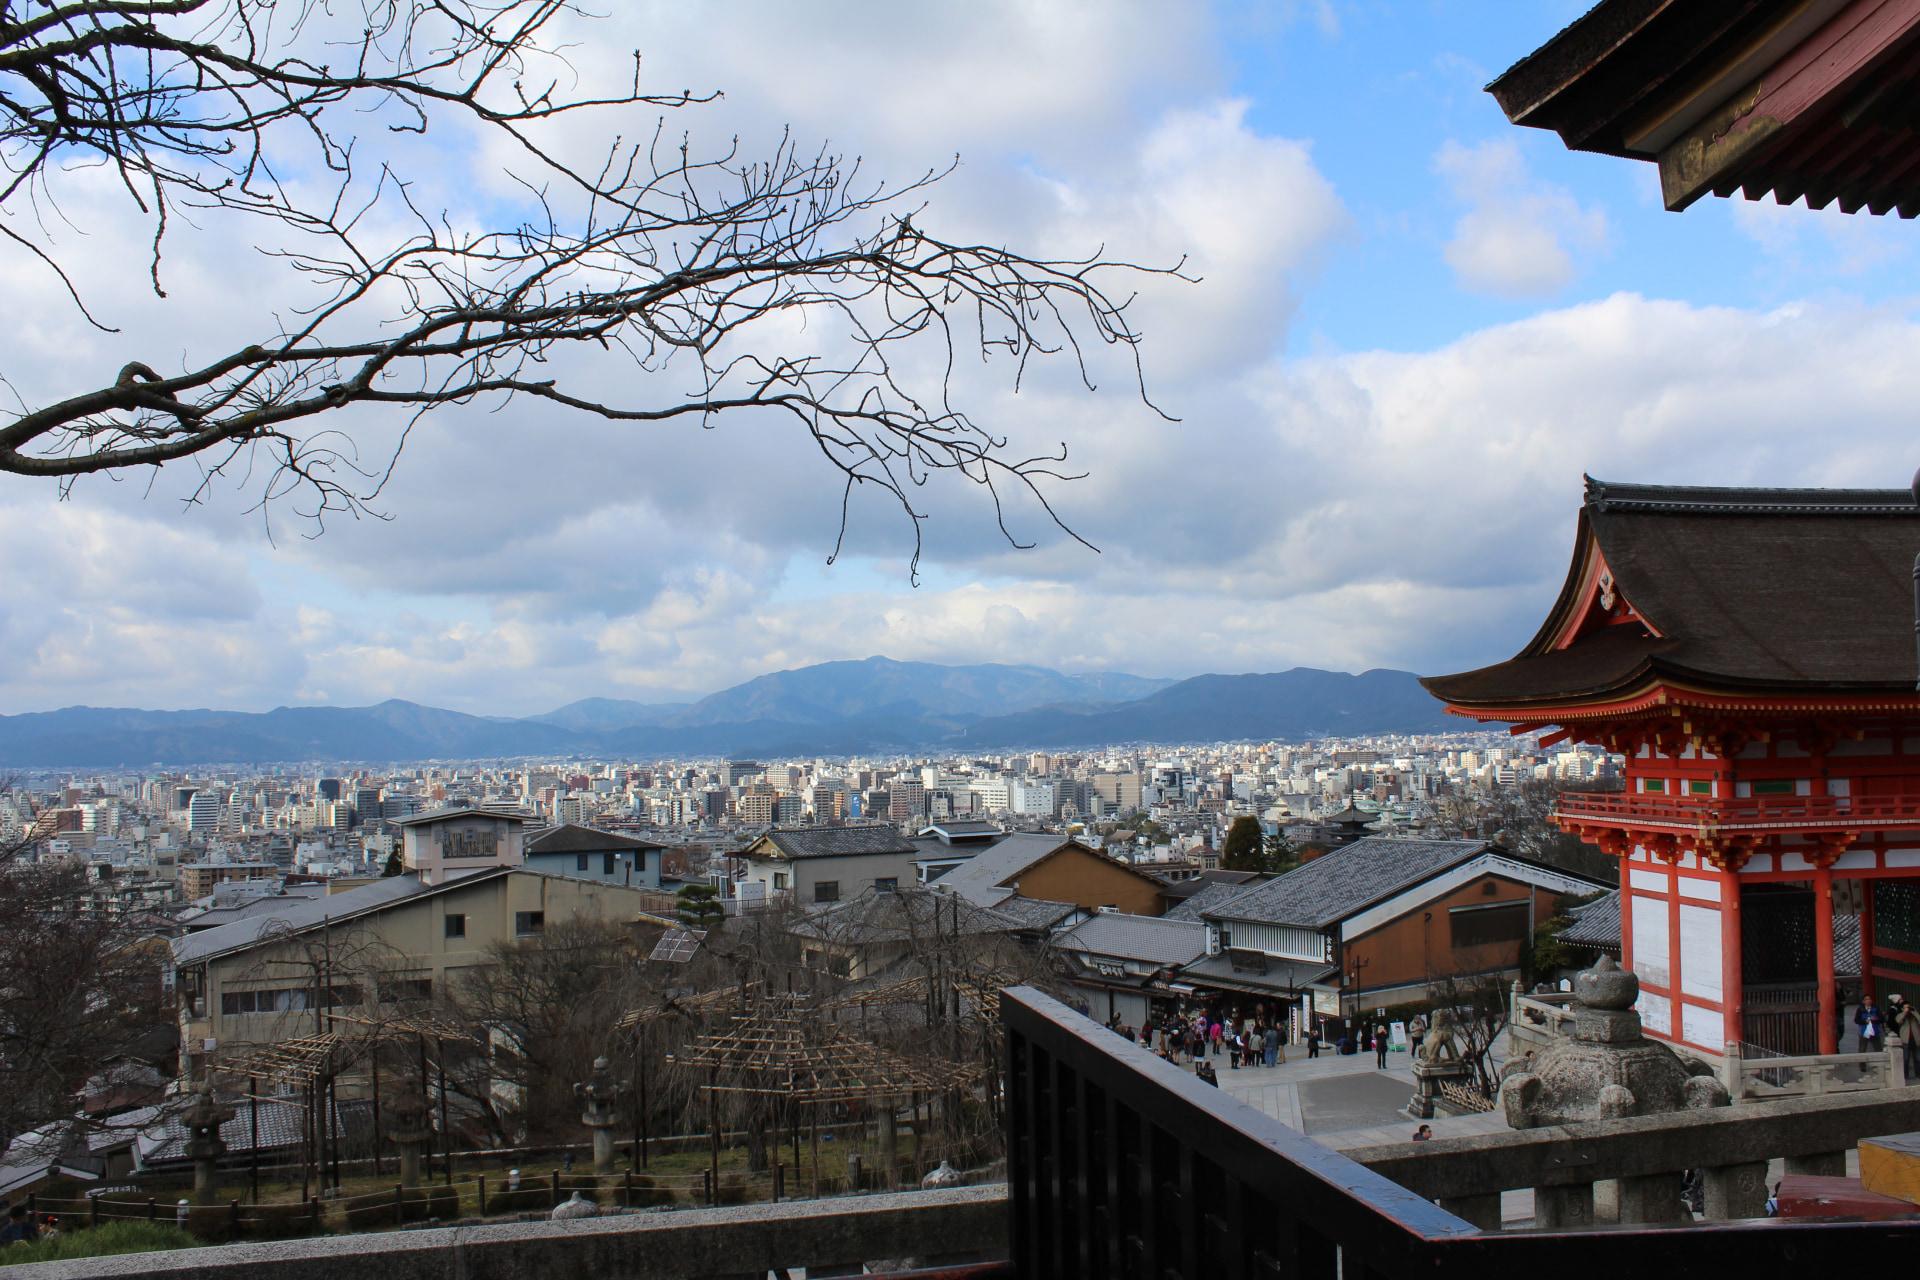 templi di Kyoto kiyomizudera